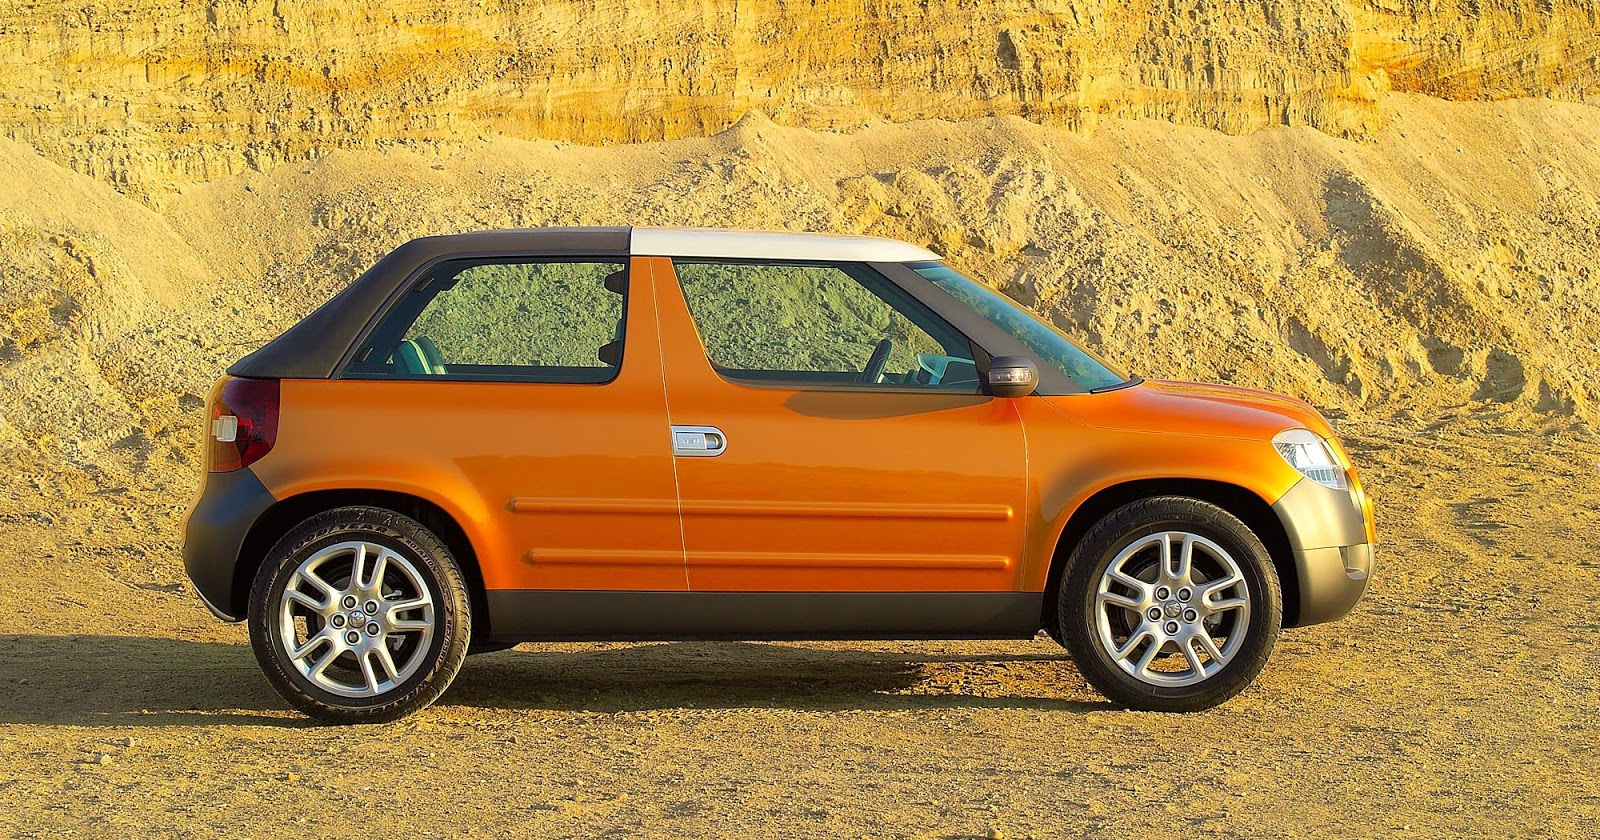 Skoda Yeti Roadster show car